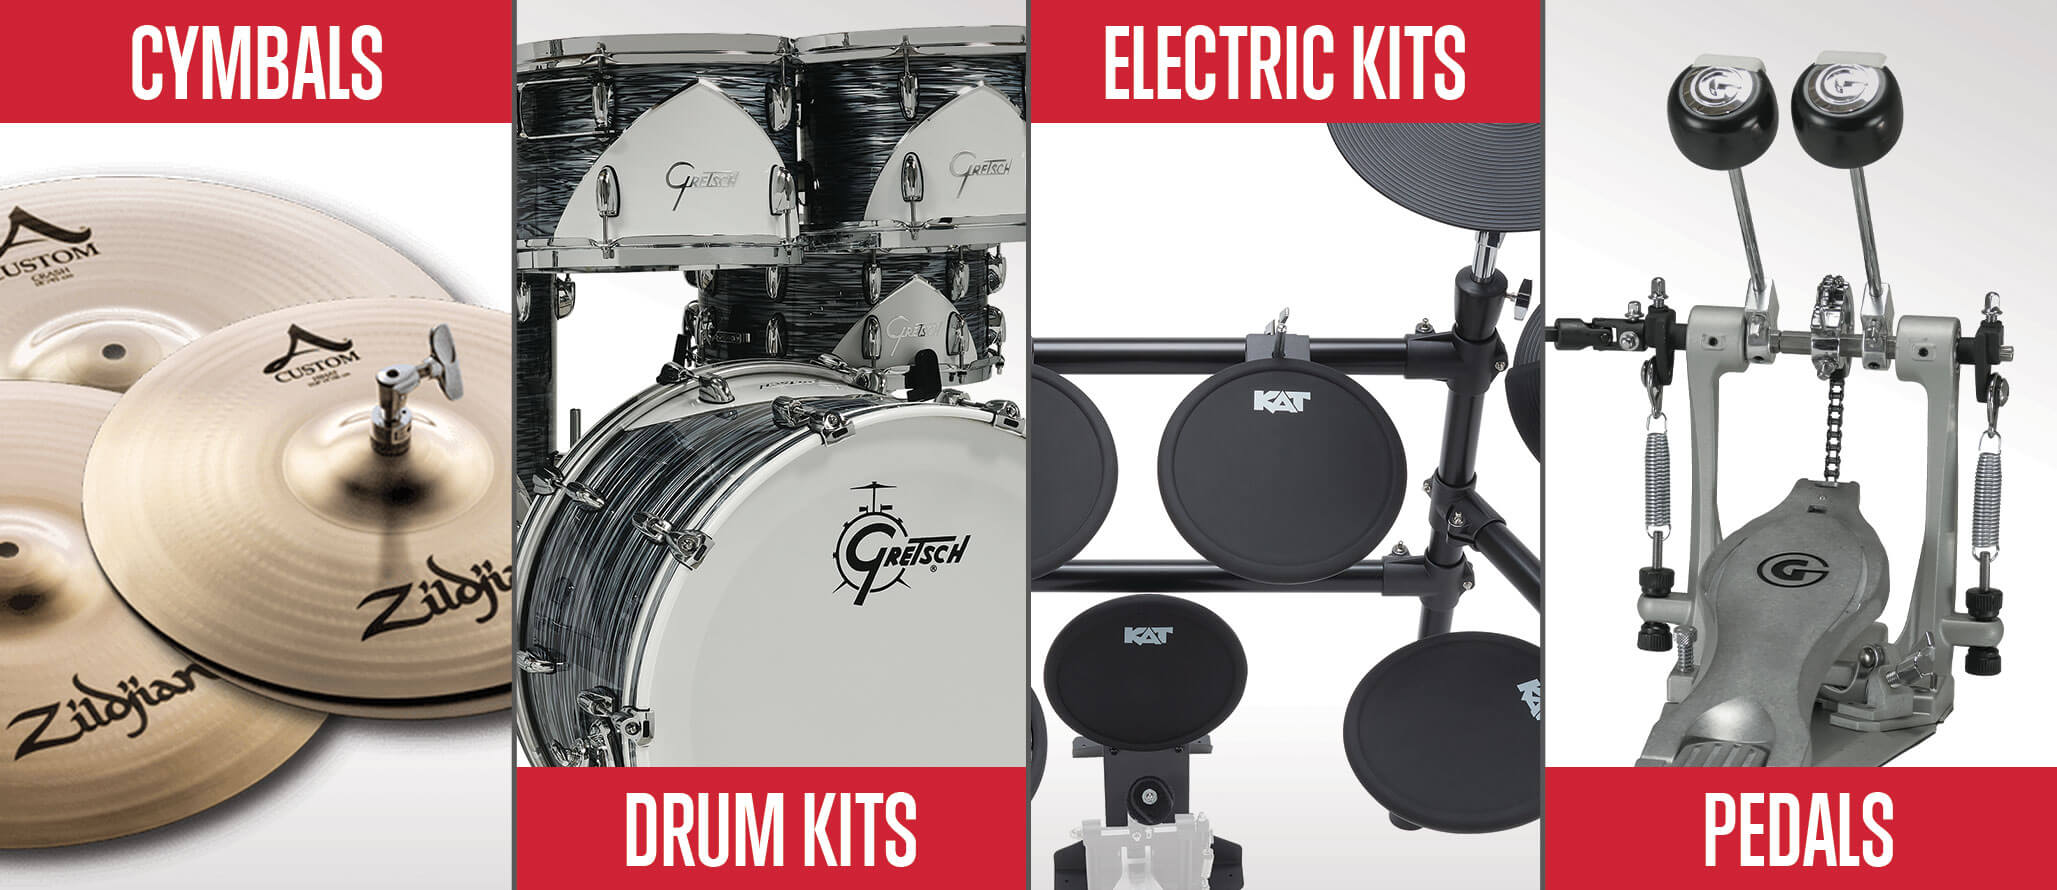 School of Rock sells drum kits and drum accessories